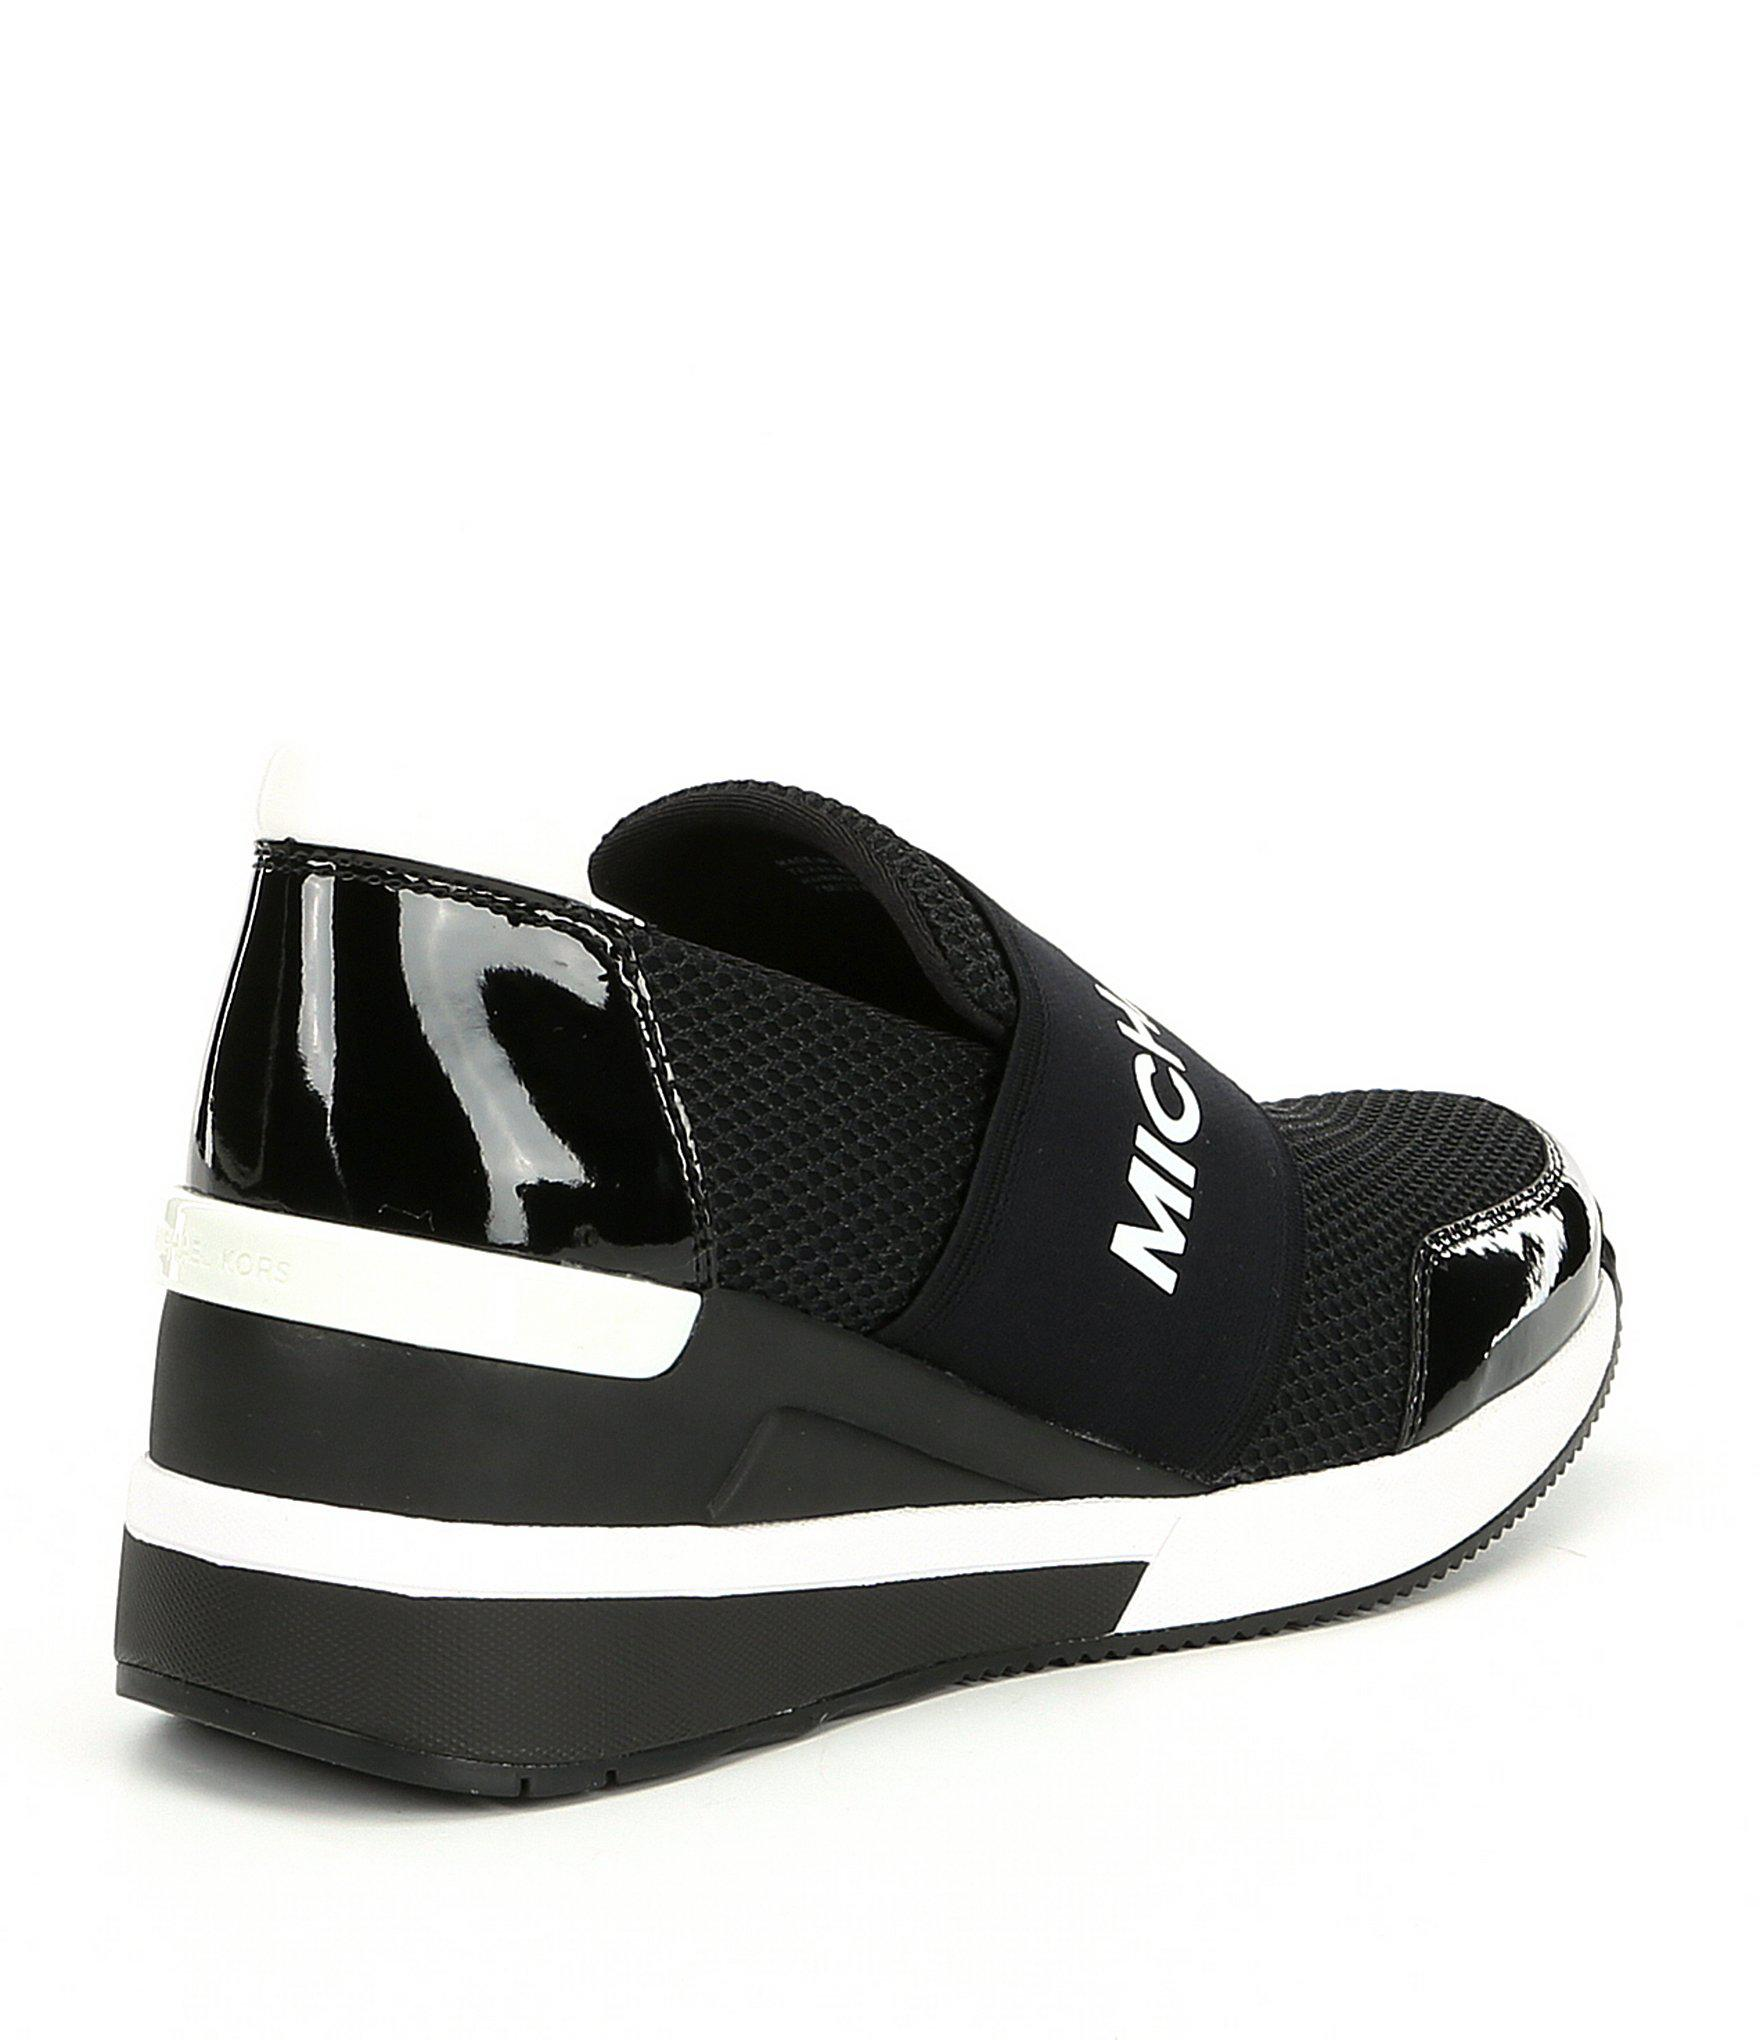 quality design 29160 c20bc ... Felix Trainer Slip-on Wedge Sneakers - Lyst. View fullscreen